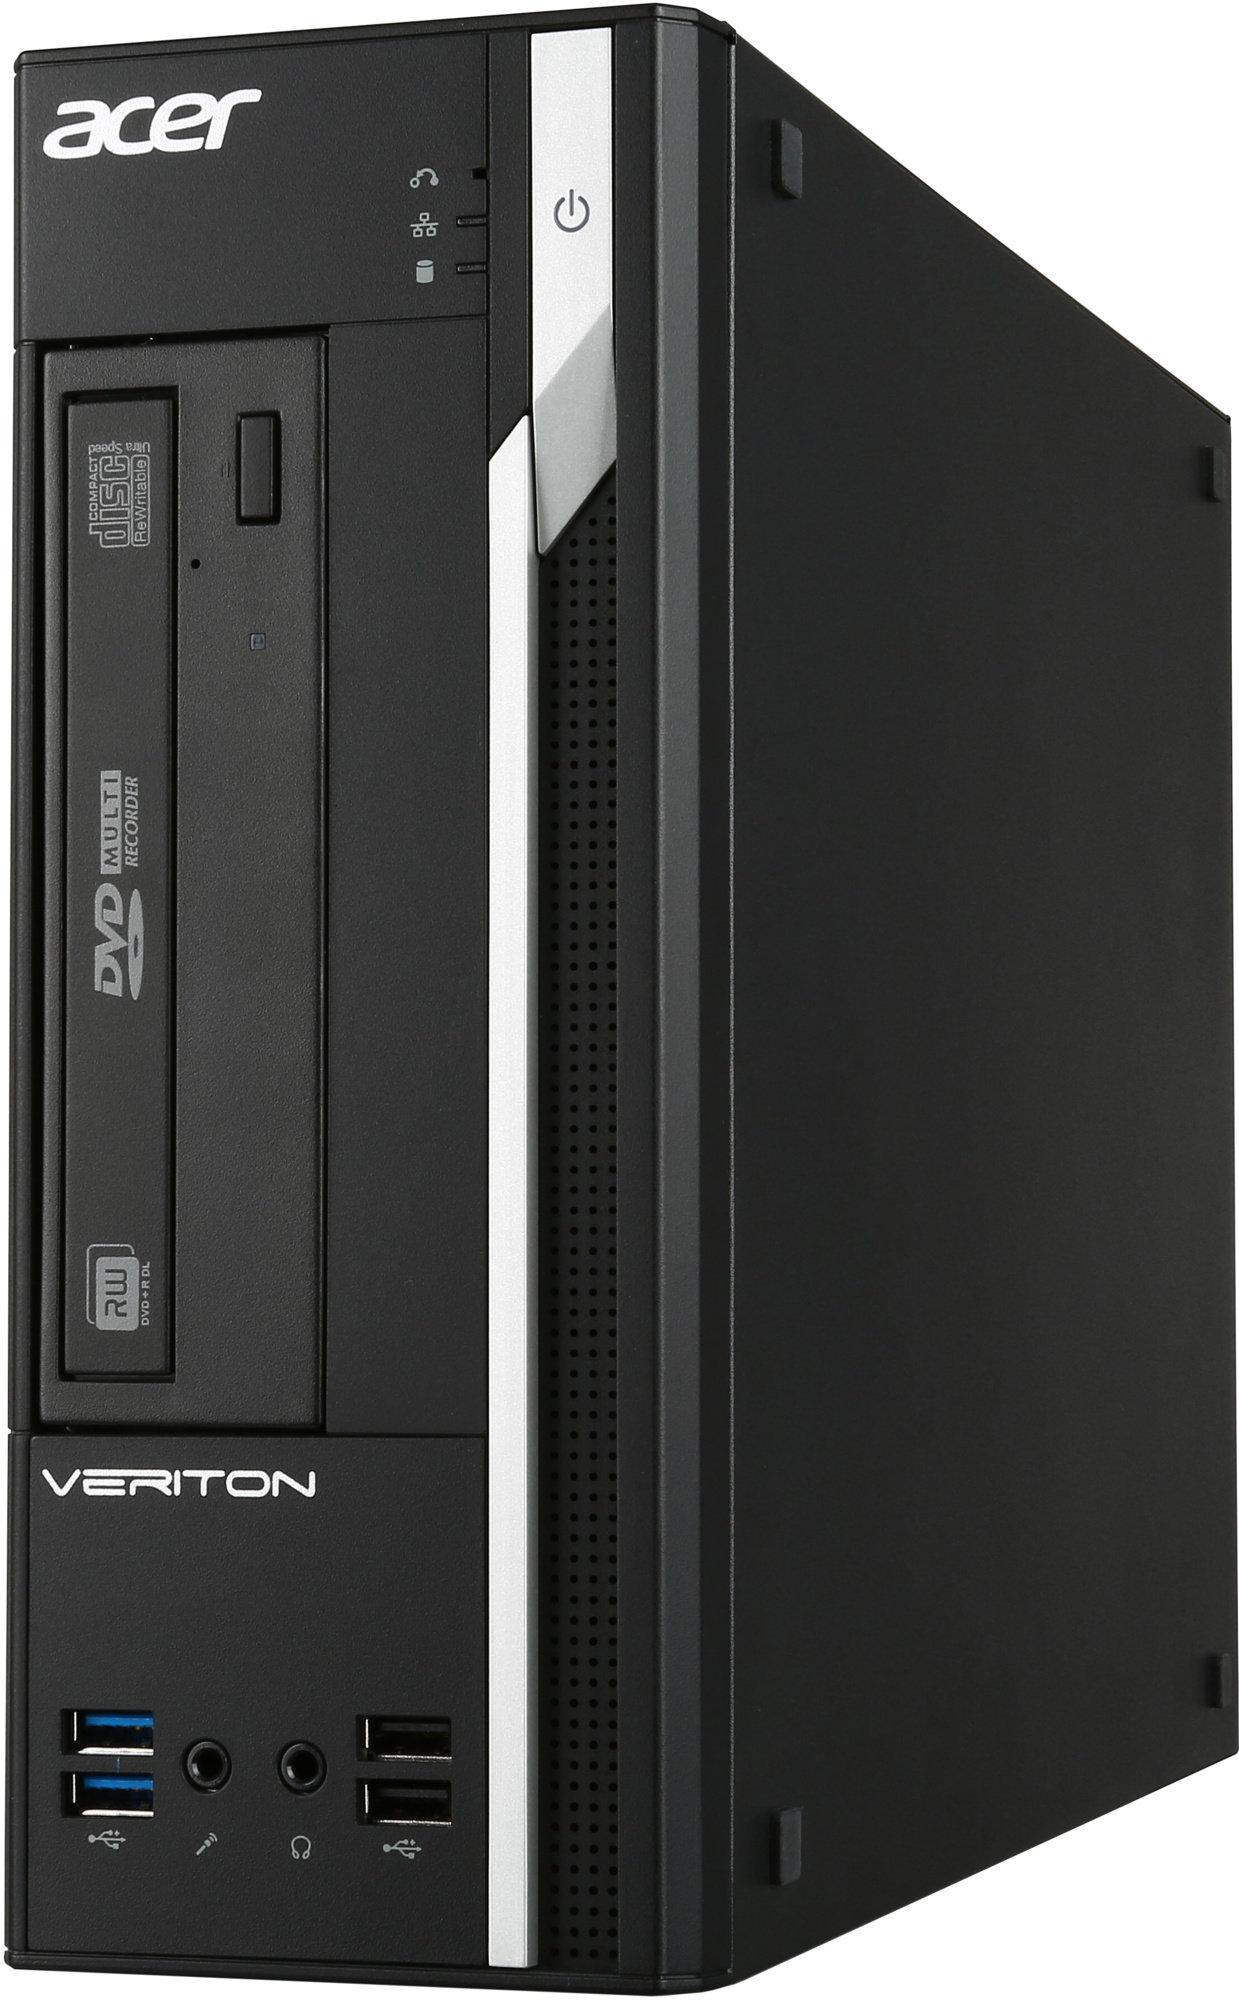 Acer Veriton X4640G SFF